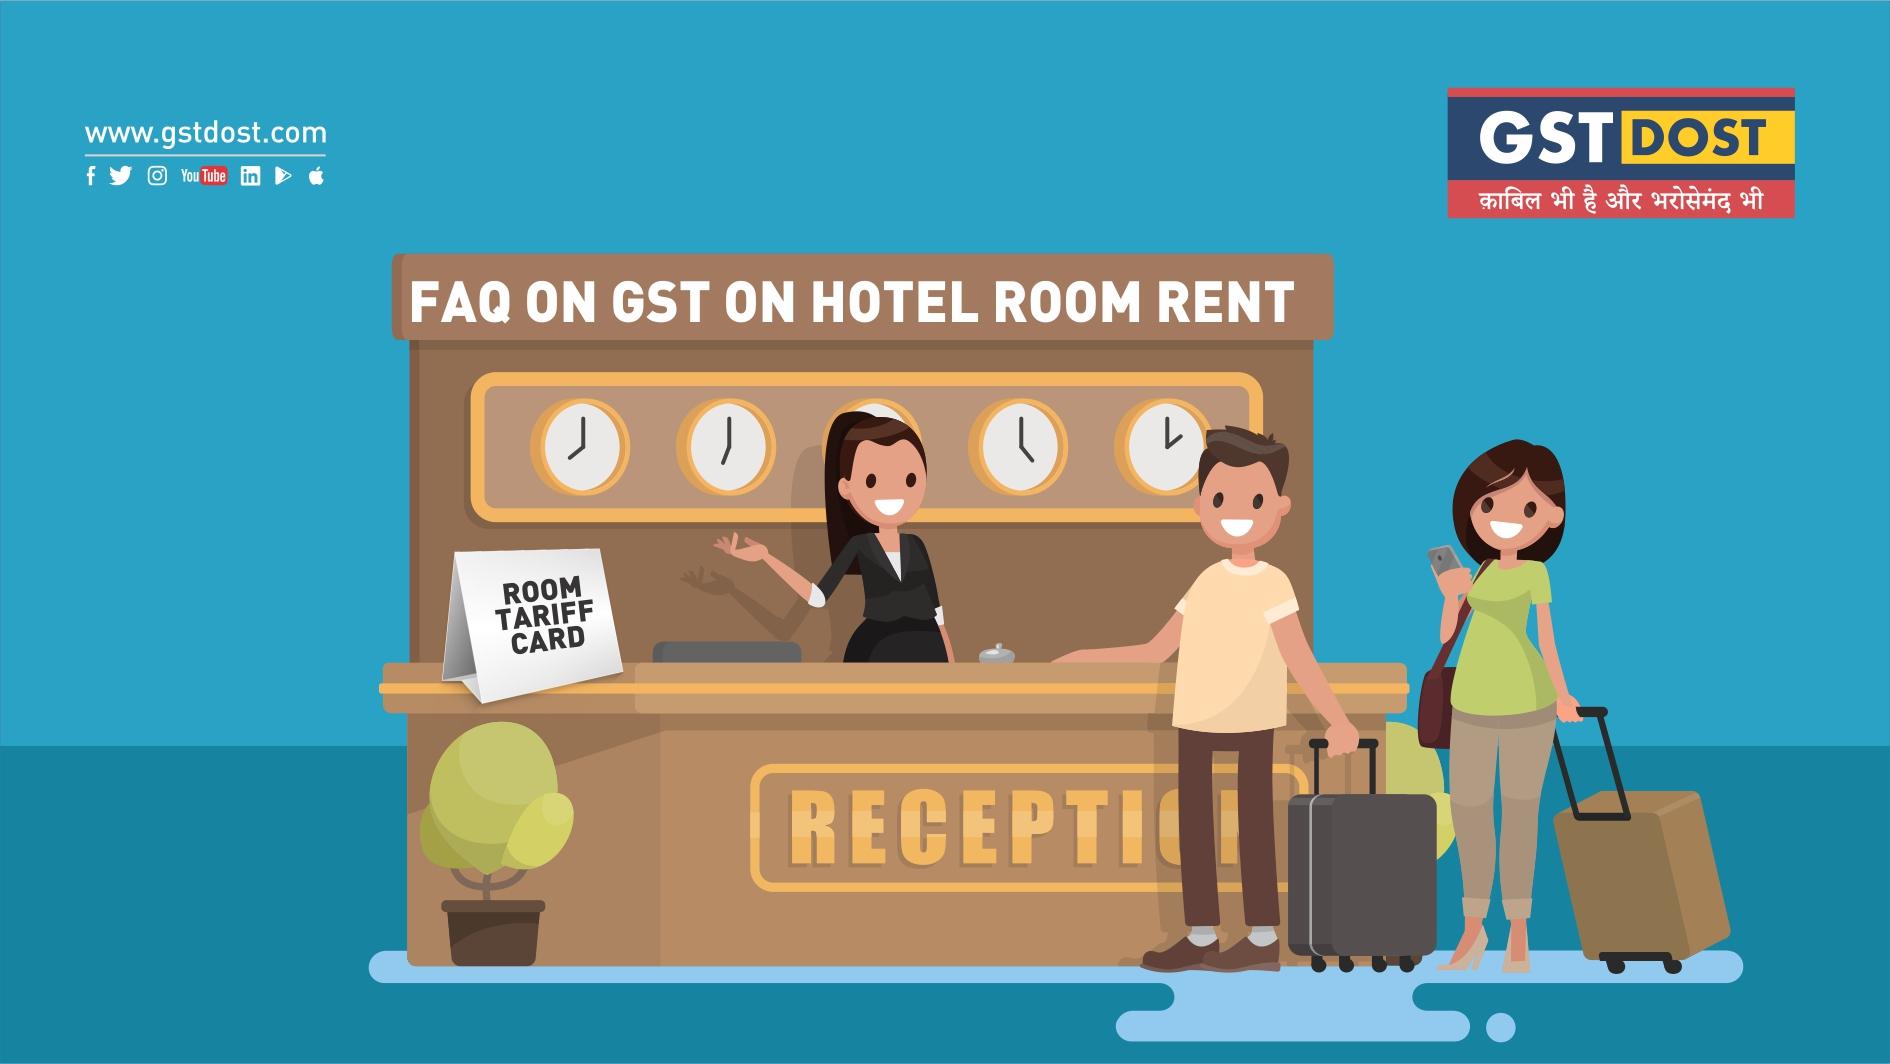 FAQ on GST on Hotel Room Rent